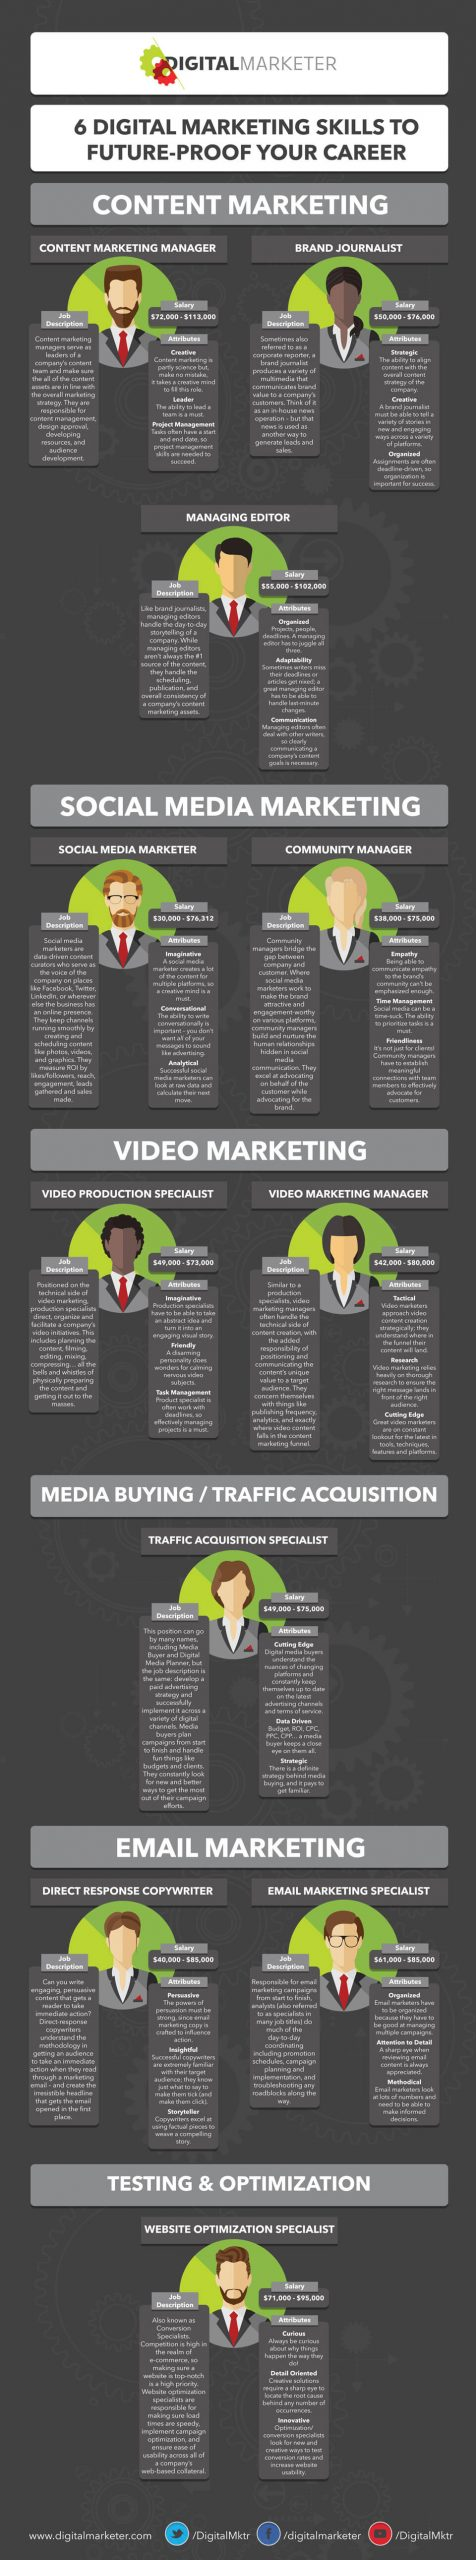 Digital Marketing Skills Infographic compressed.jpg